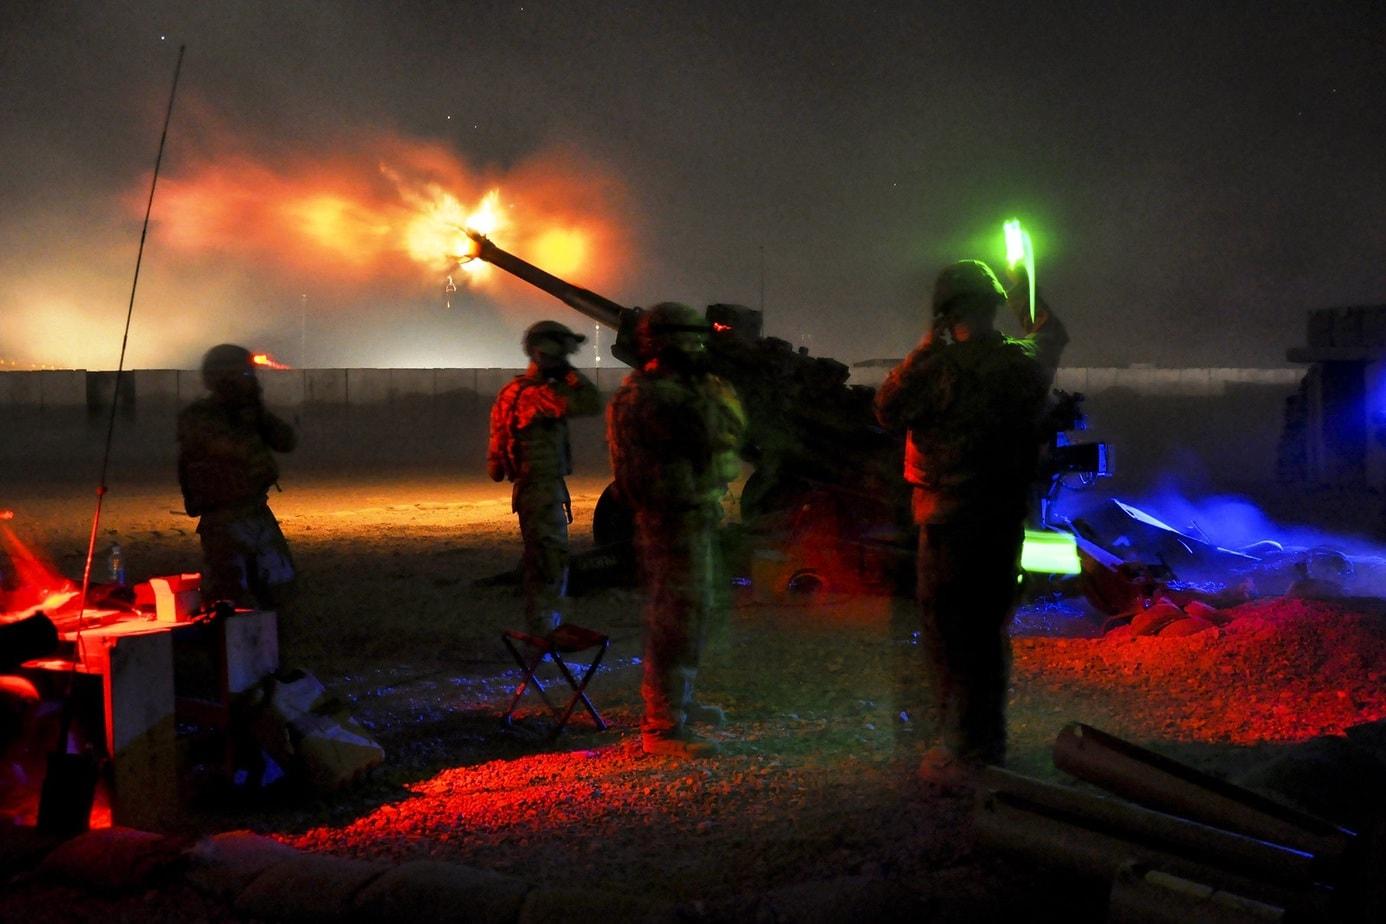 U.S. Army Hypersonic